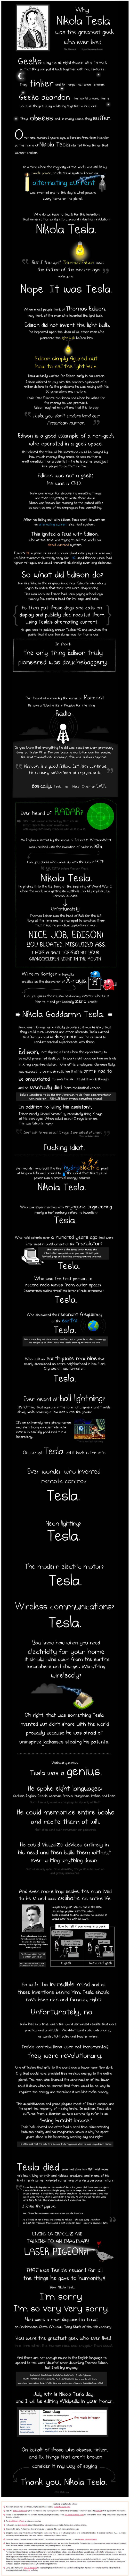 The Greatest #Geek Who Ever Lived! Happy Birthday #Tesla! Image courtesy to The Oatmeal: http://theoatmeal.com/comics/tesla